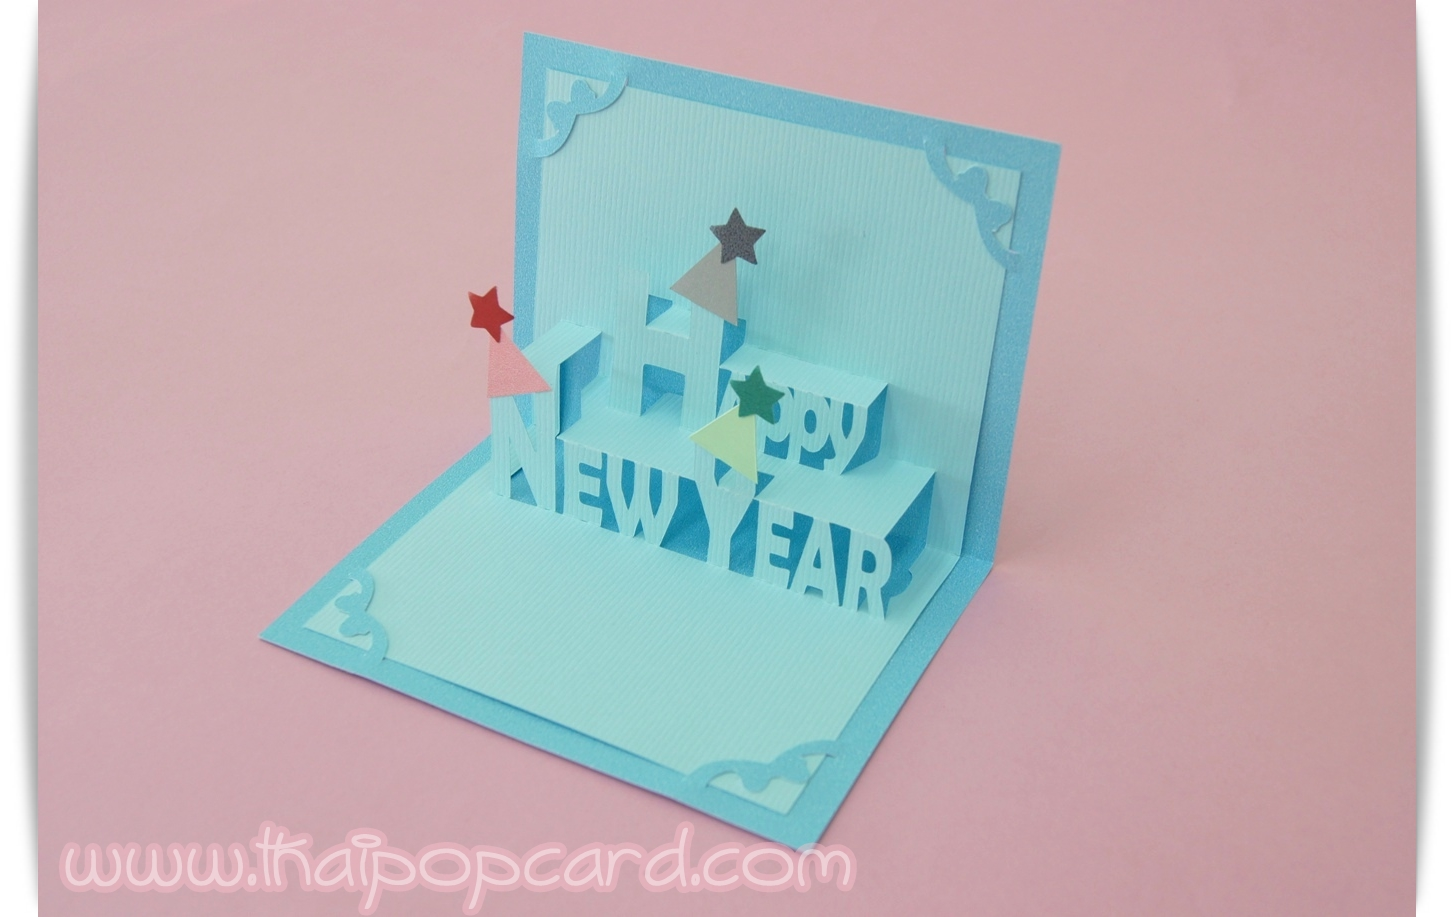 A60การ์ด Happy New Year โทนสีฟ้าอ่อน